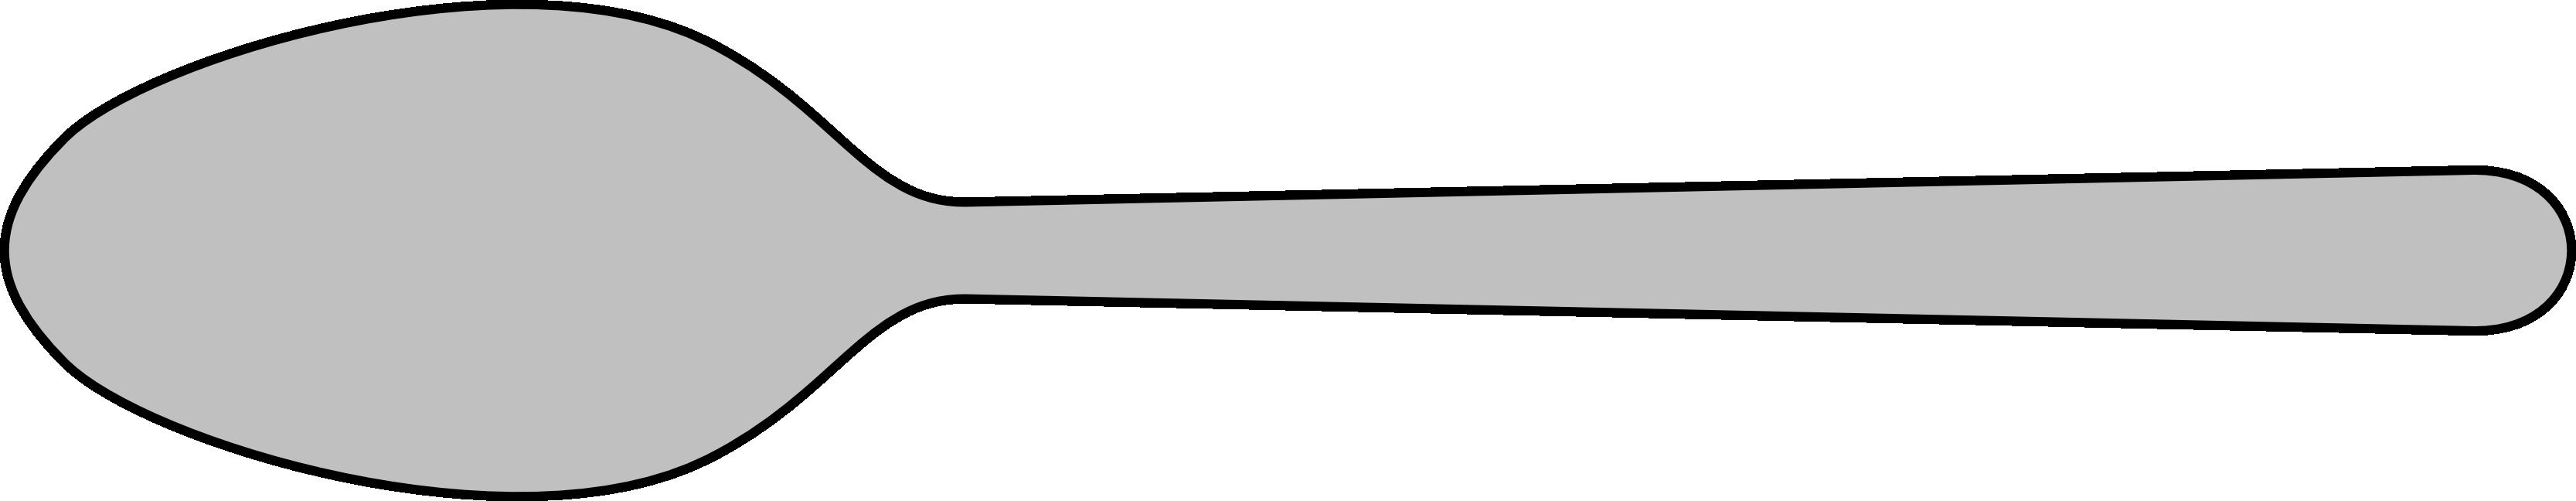 Spoon Clip Art - Spoon Clip Art